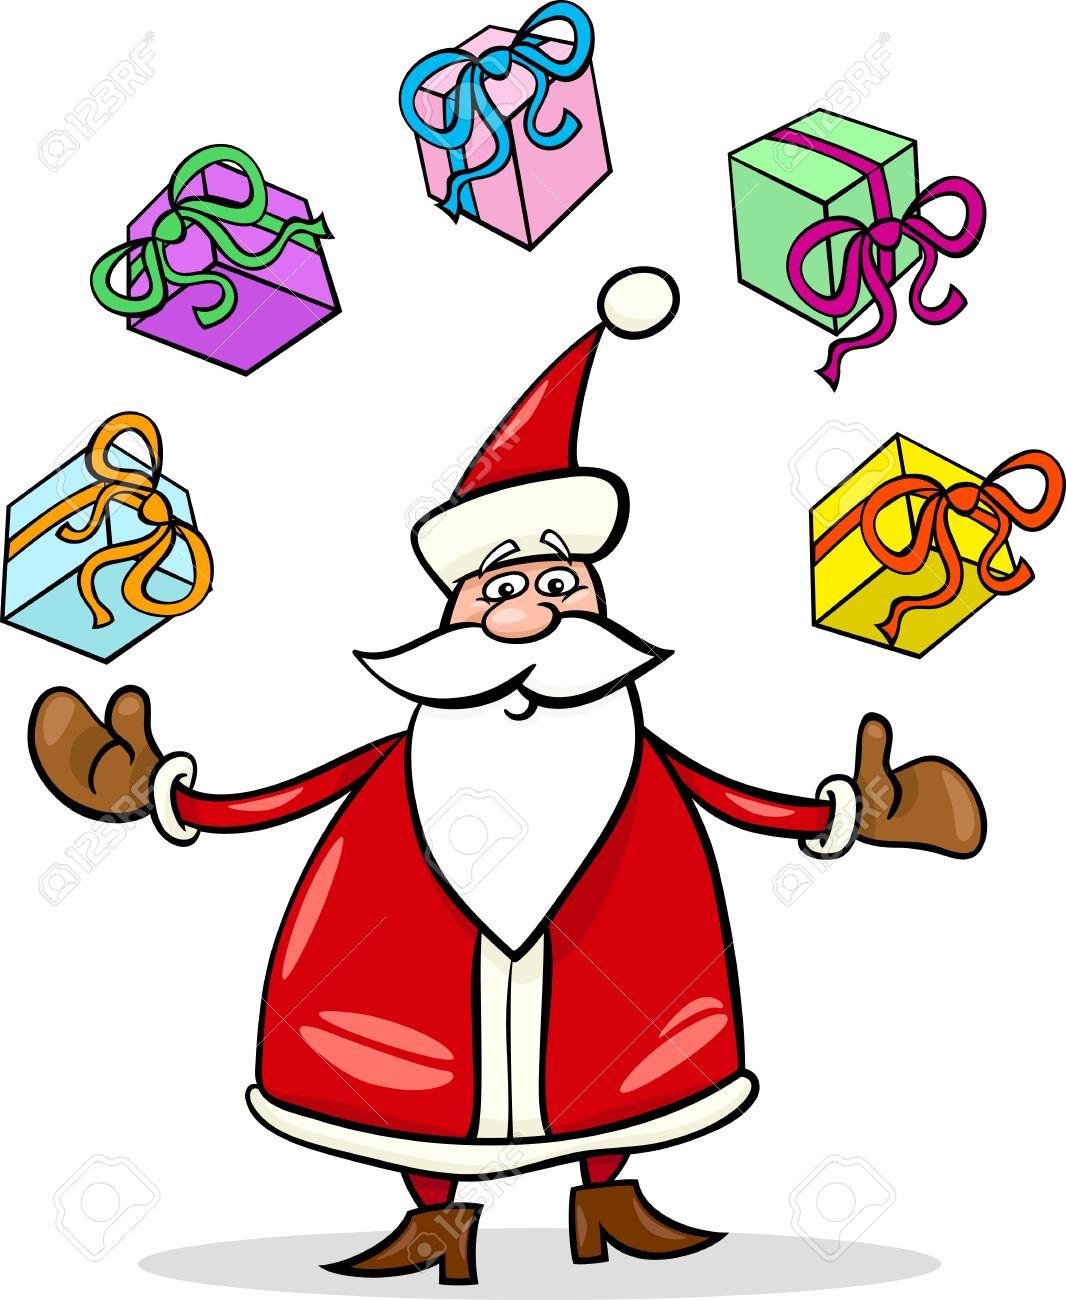 Cartoon Illustration Of Funny Santa Claus Or Papa Noel Juggling ...